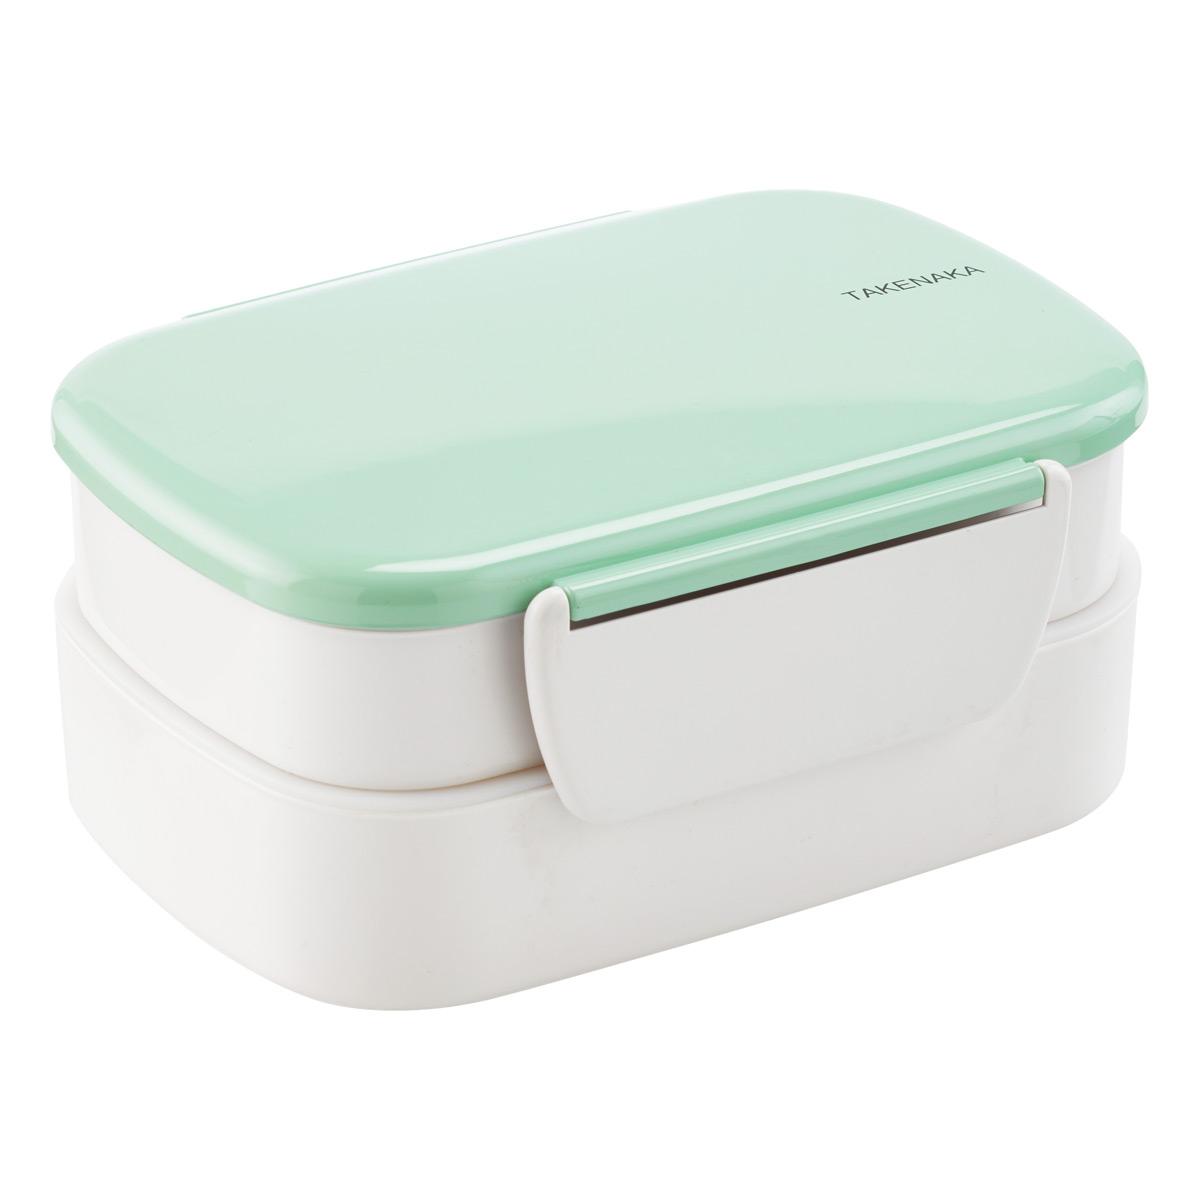 2-Tier Bento Box